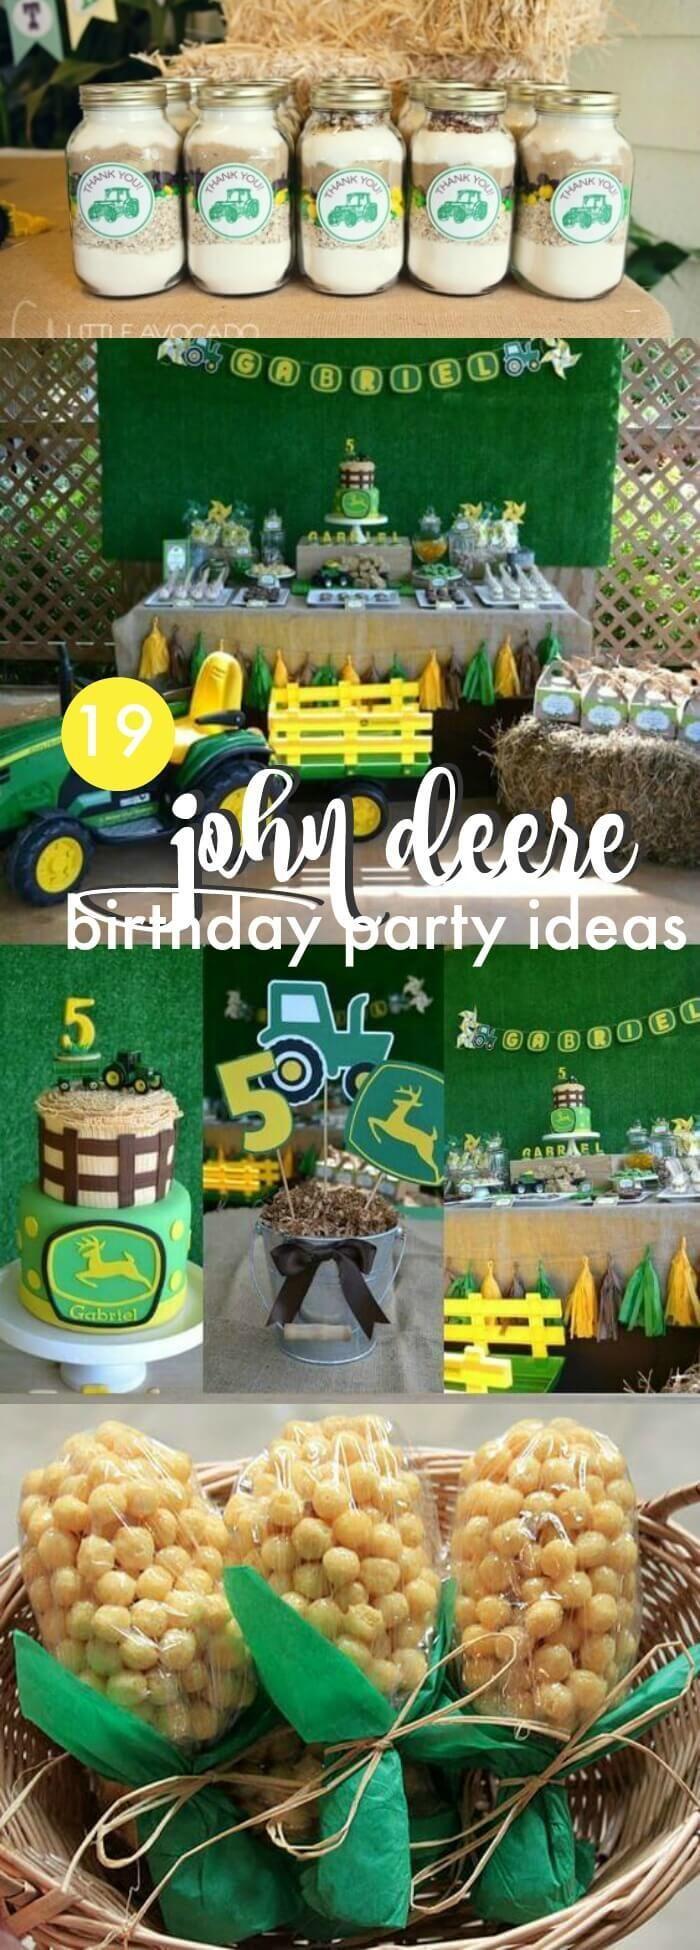 19 John Deere Tractor Party Ideas via /spaceshipslb/